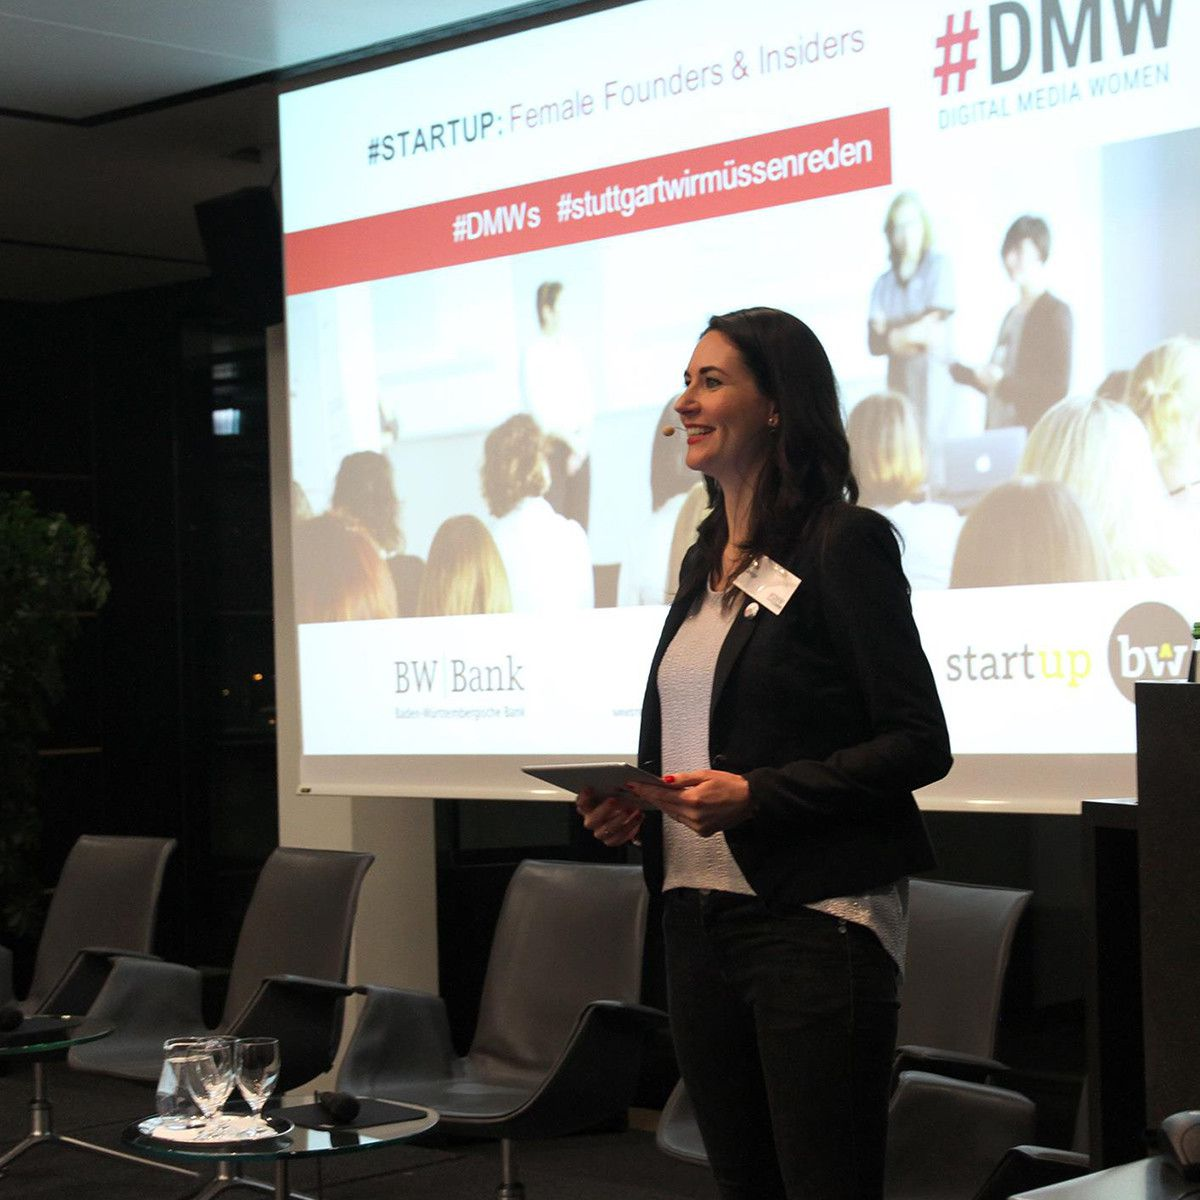 DMW Event März18